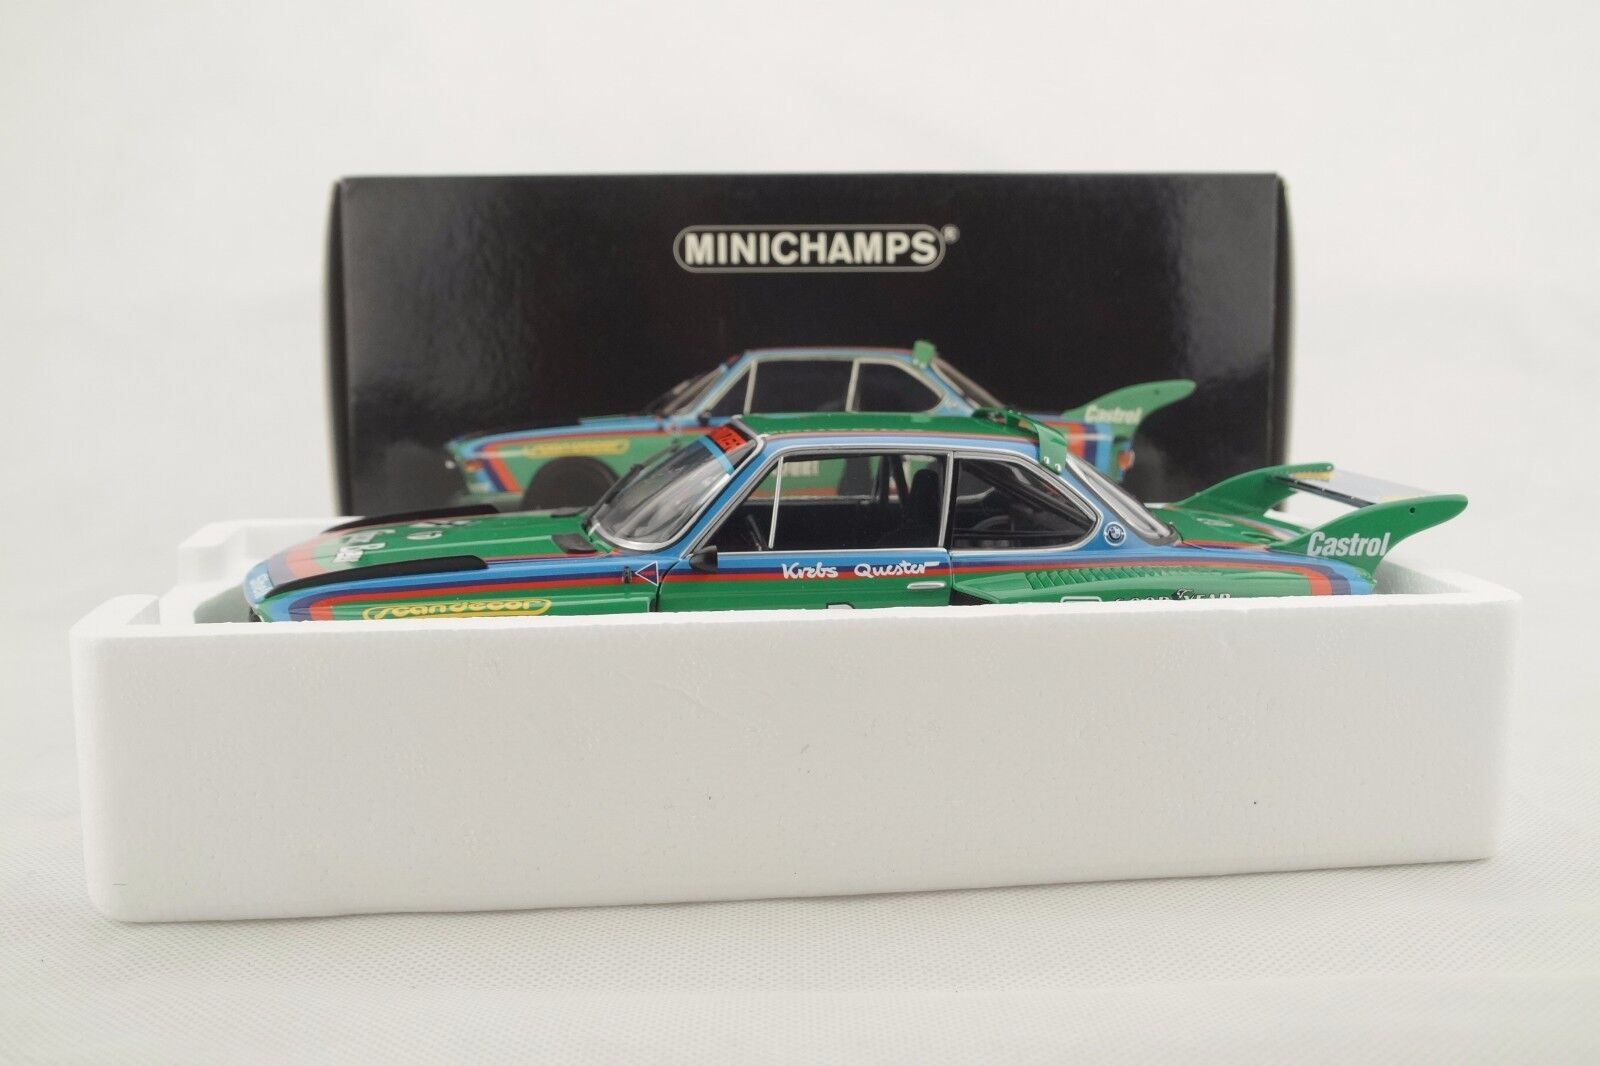 1 18 Minichamps-BMW 3.5 CSL groupe 5 1976  Gösser Bière  7 - RAR-NEUF dans neuf dans sa boîte